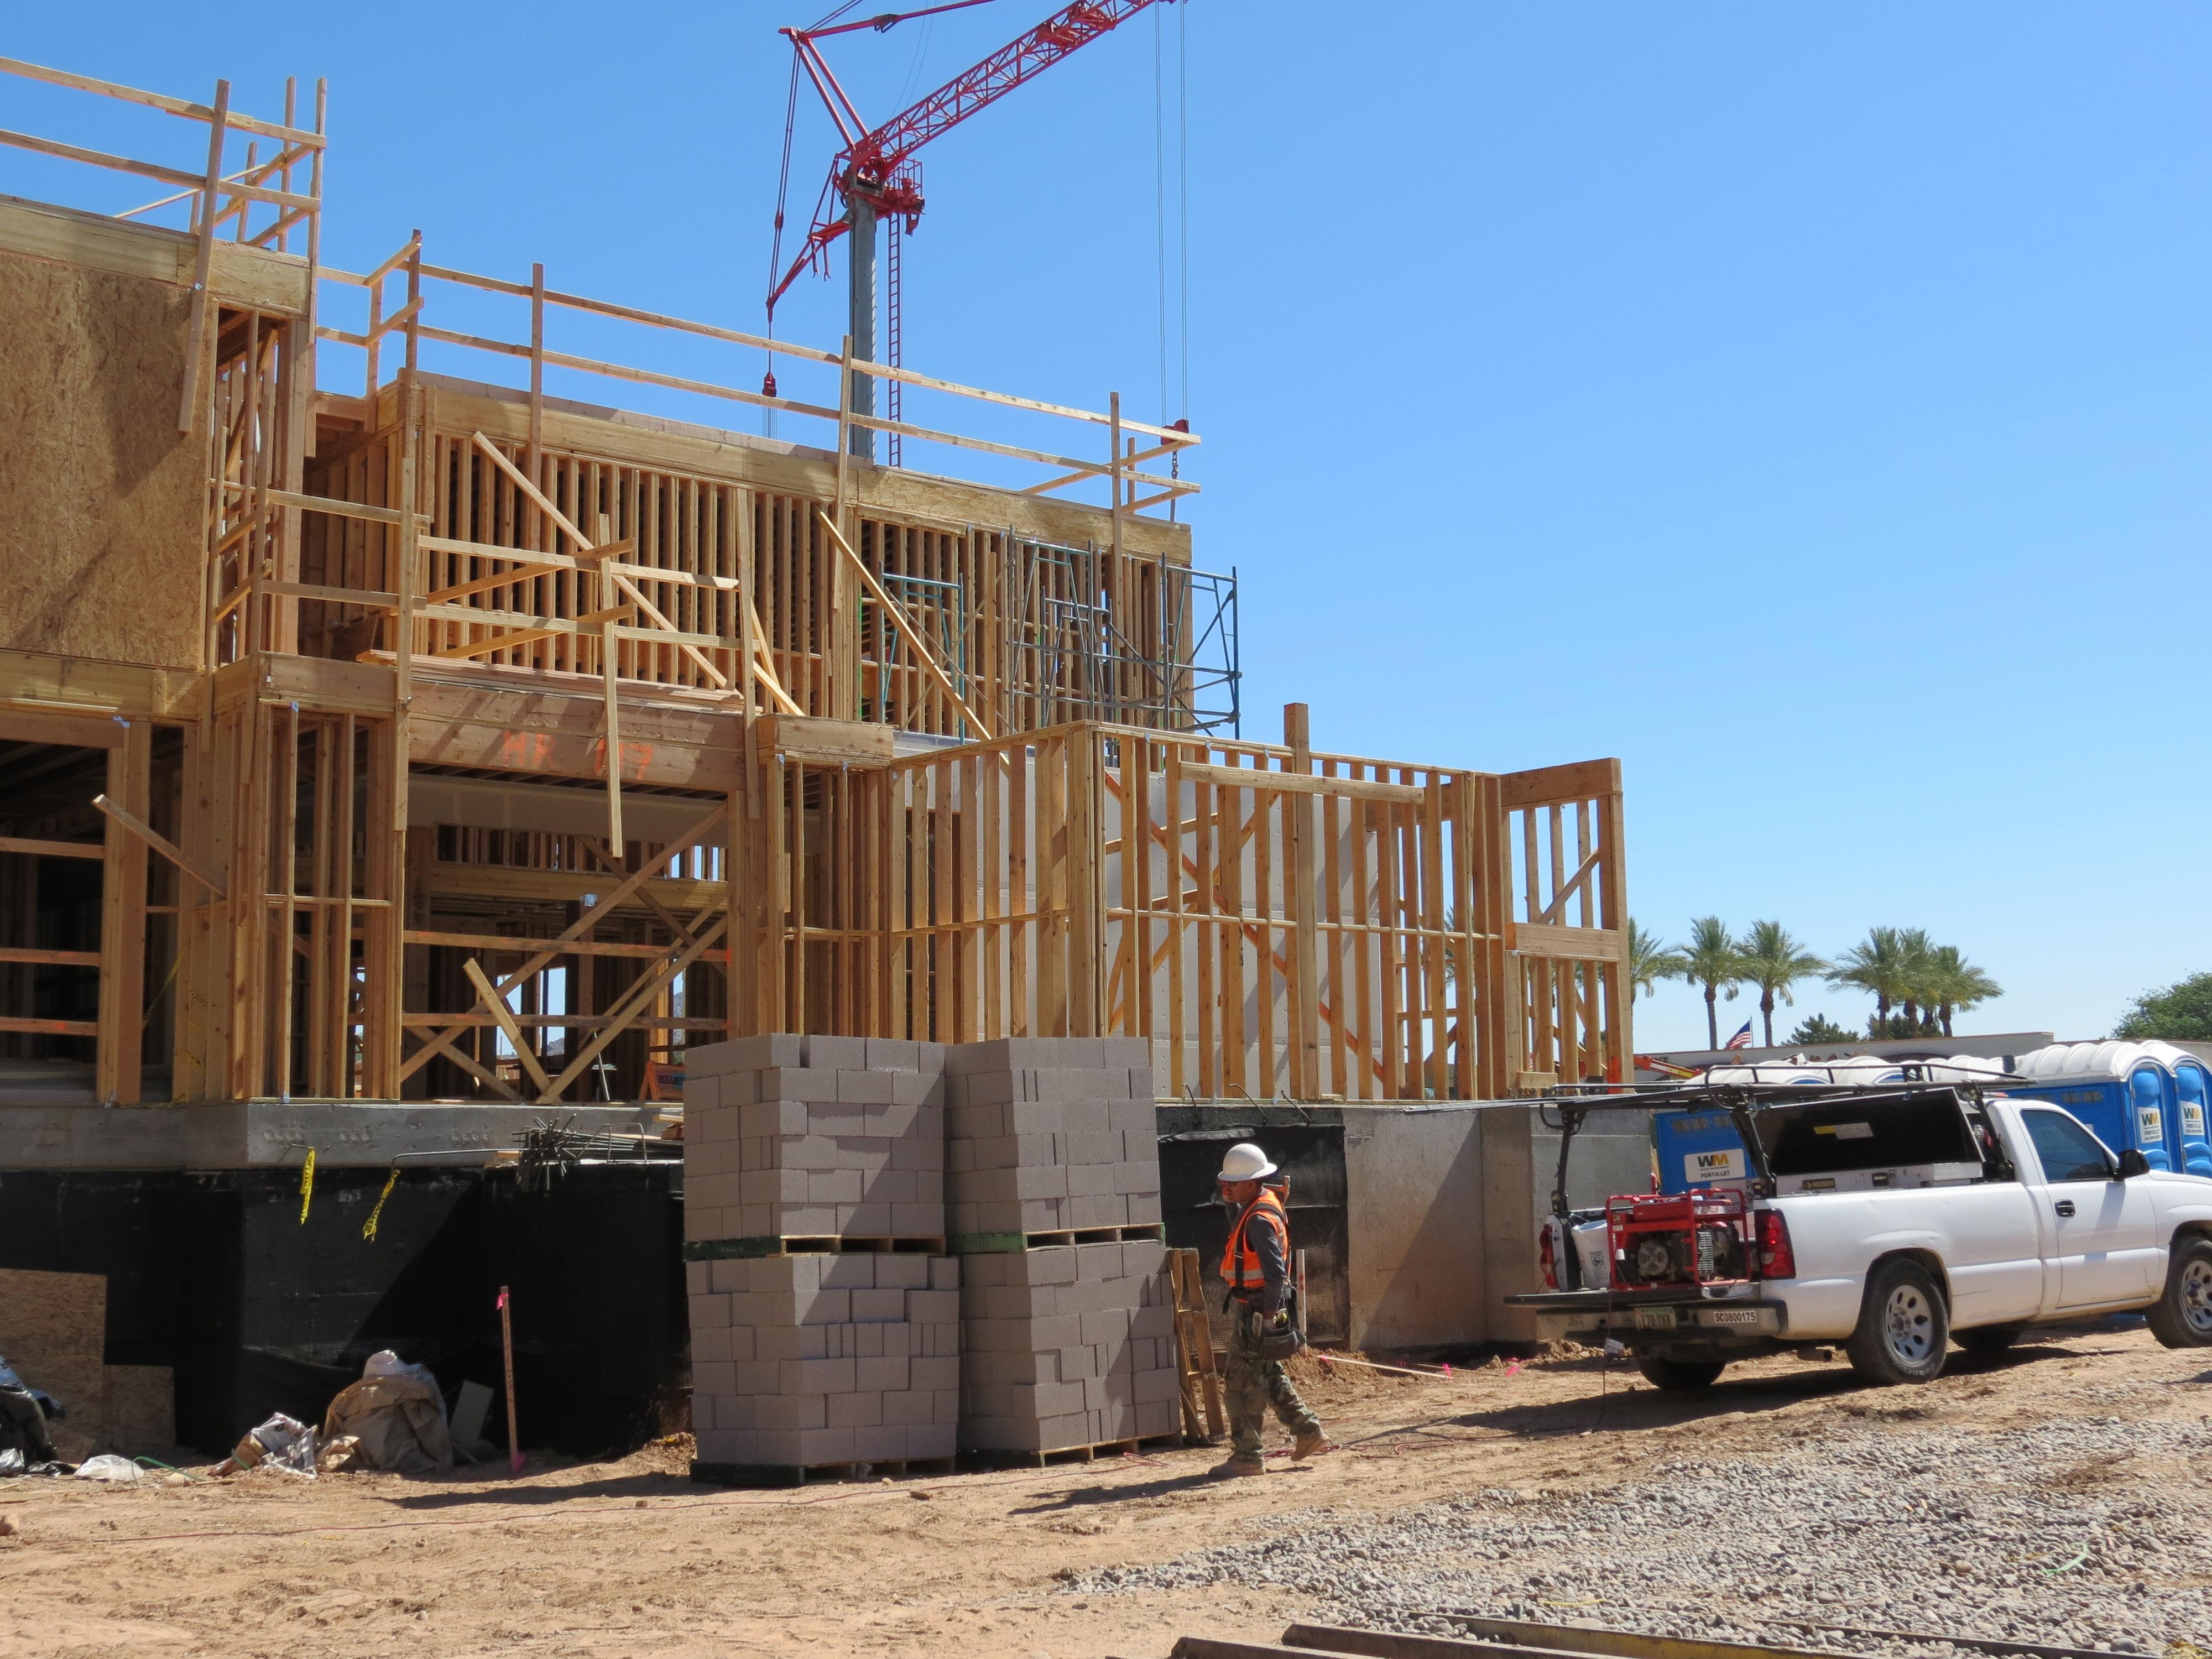 New apartment construction in Phoenix